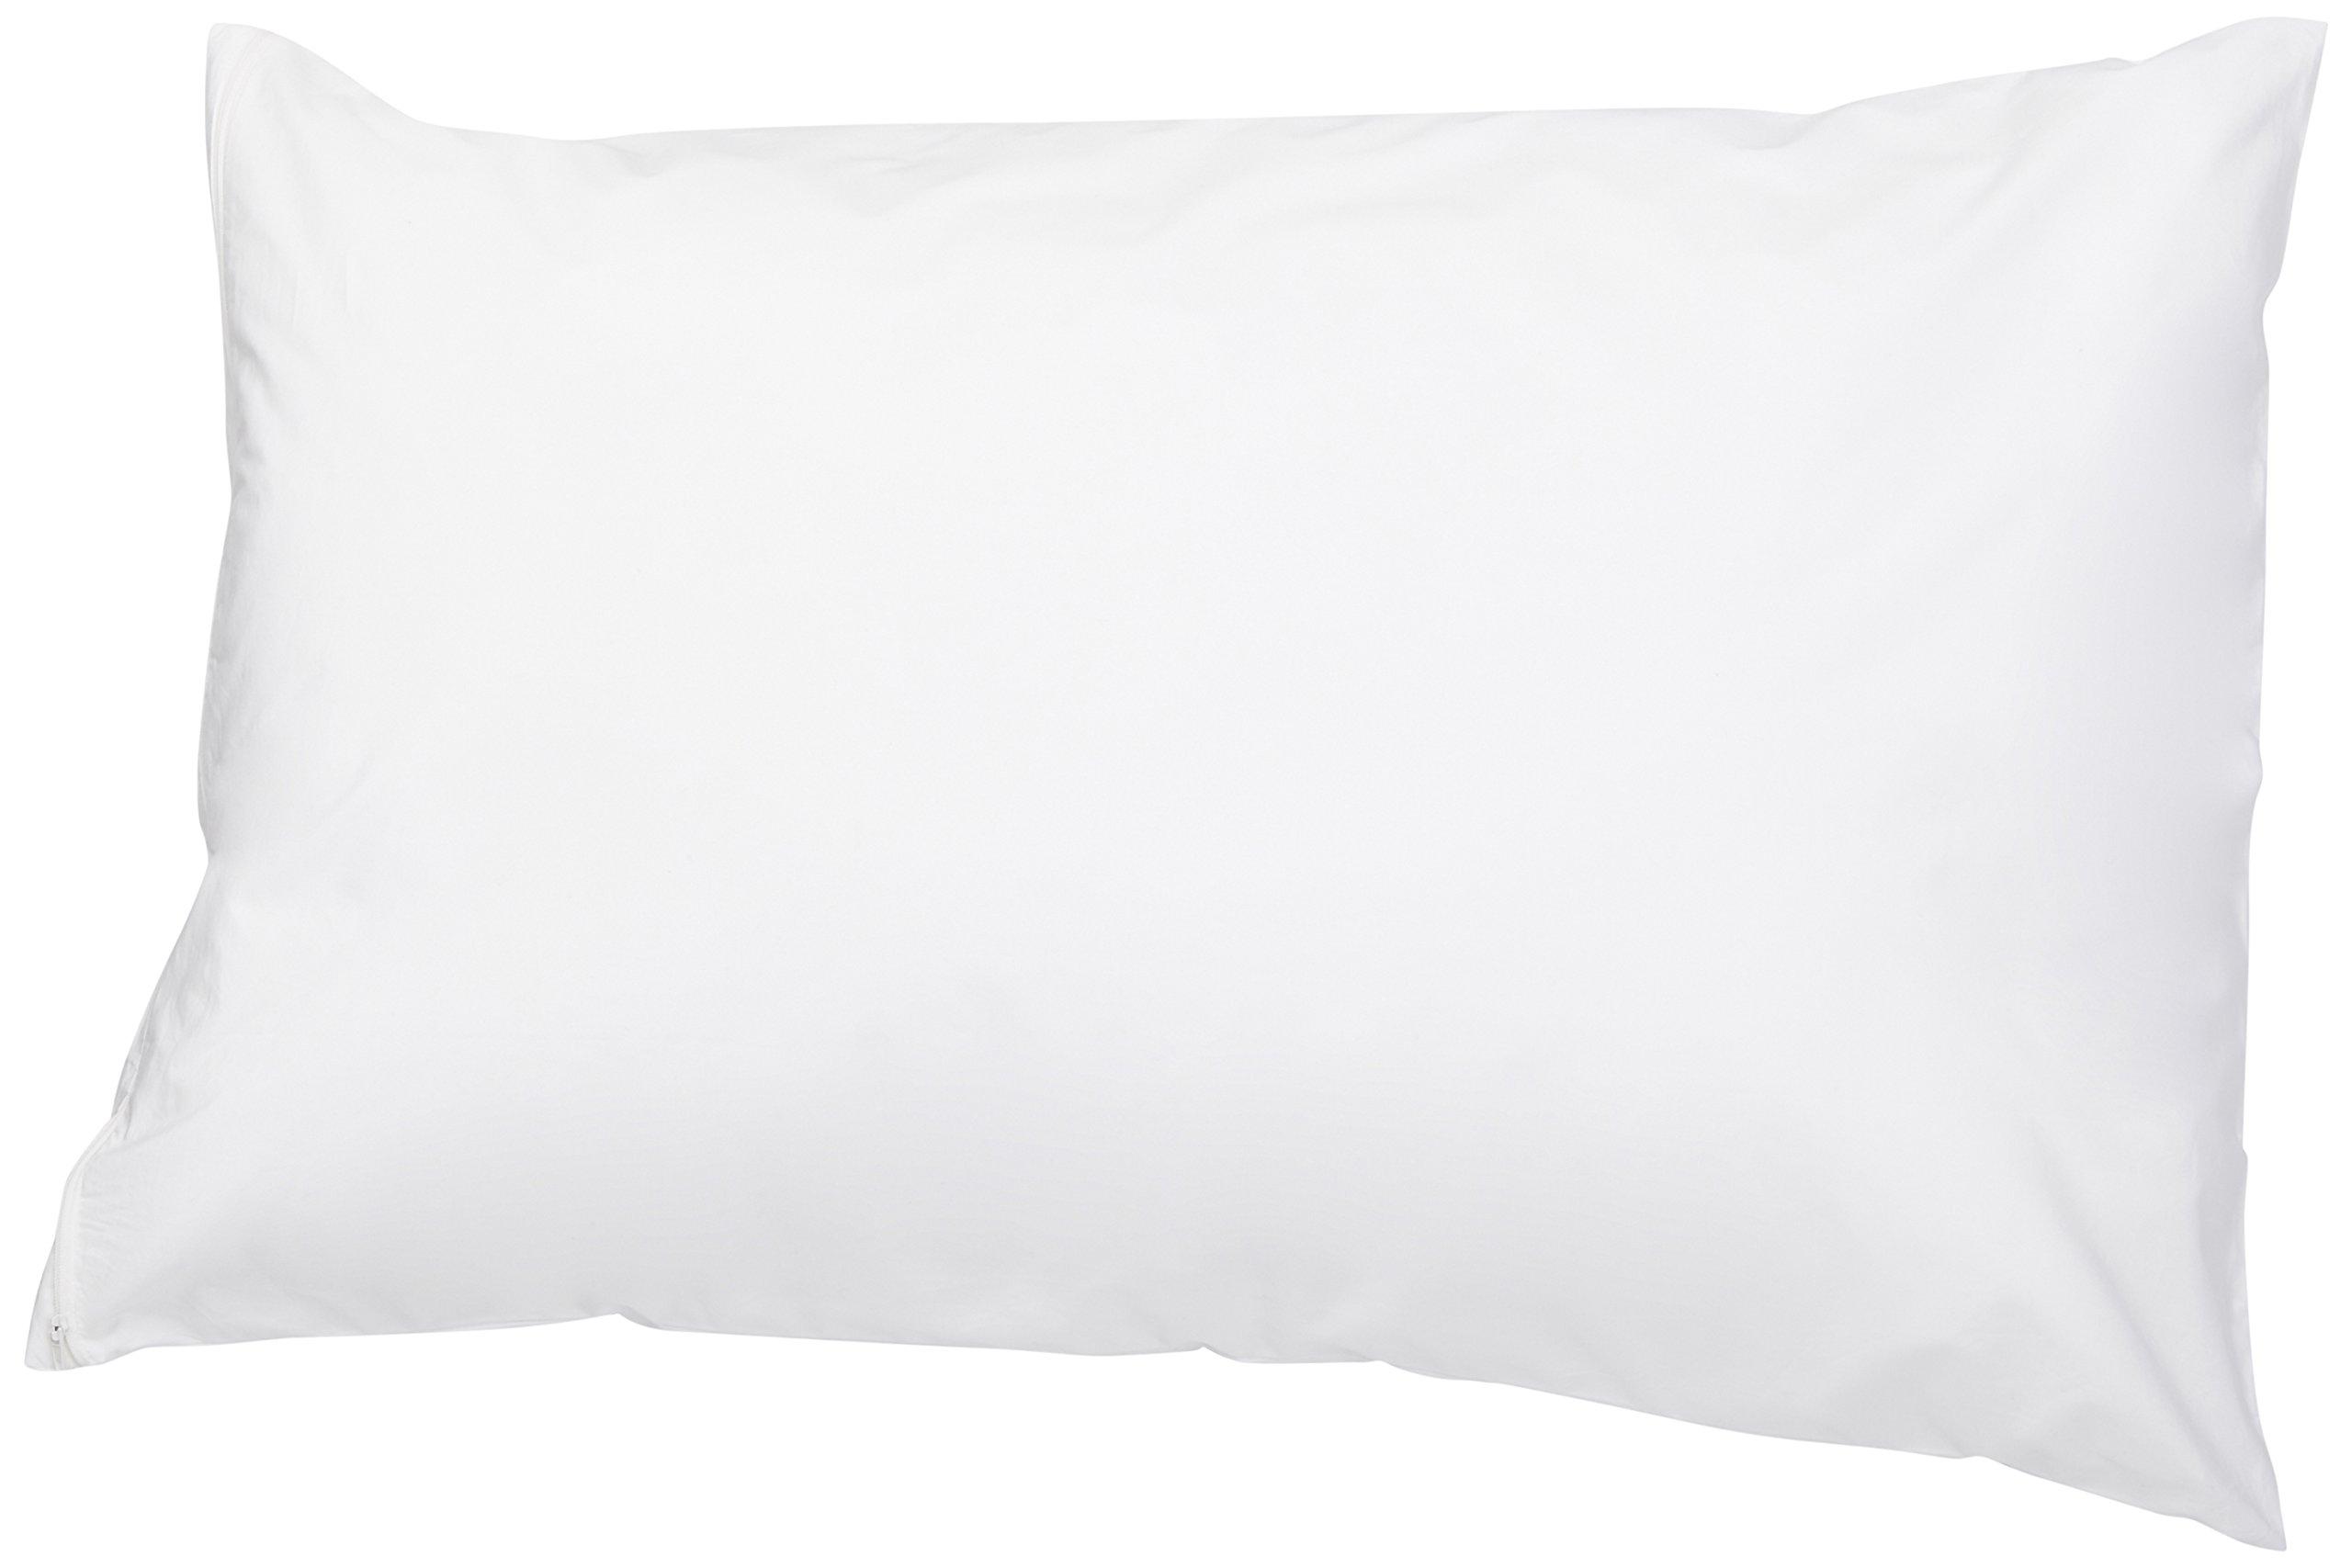 AmazonBasics Hypoallergenic Pillow Protector, White, Queen